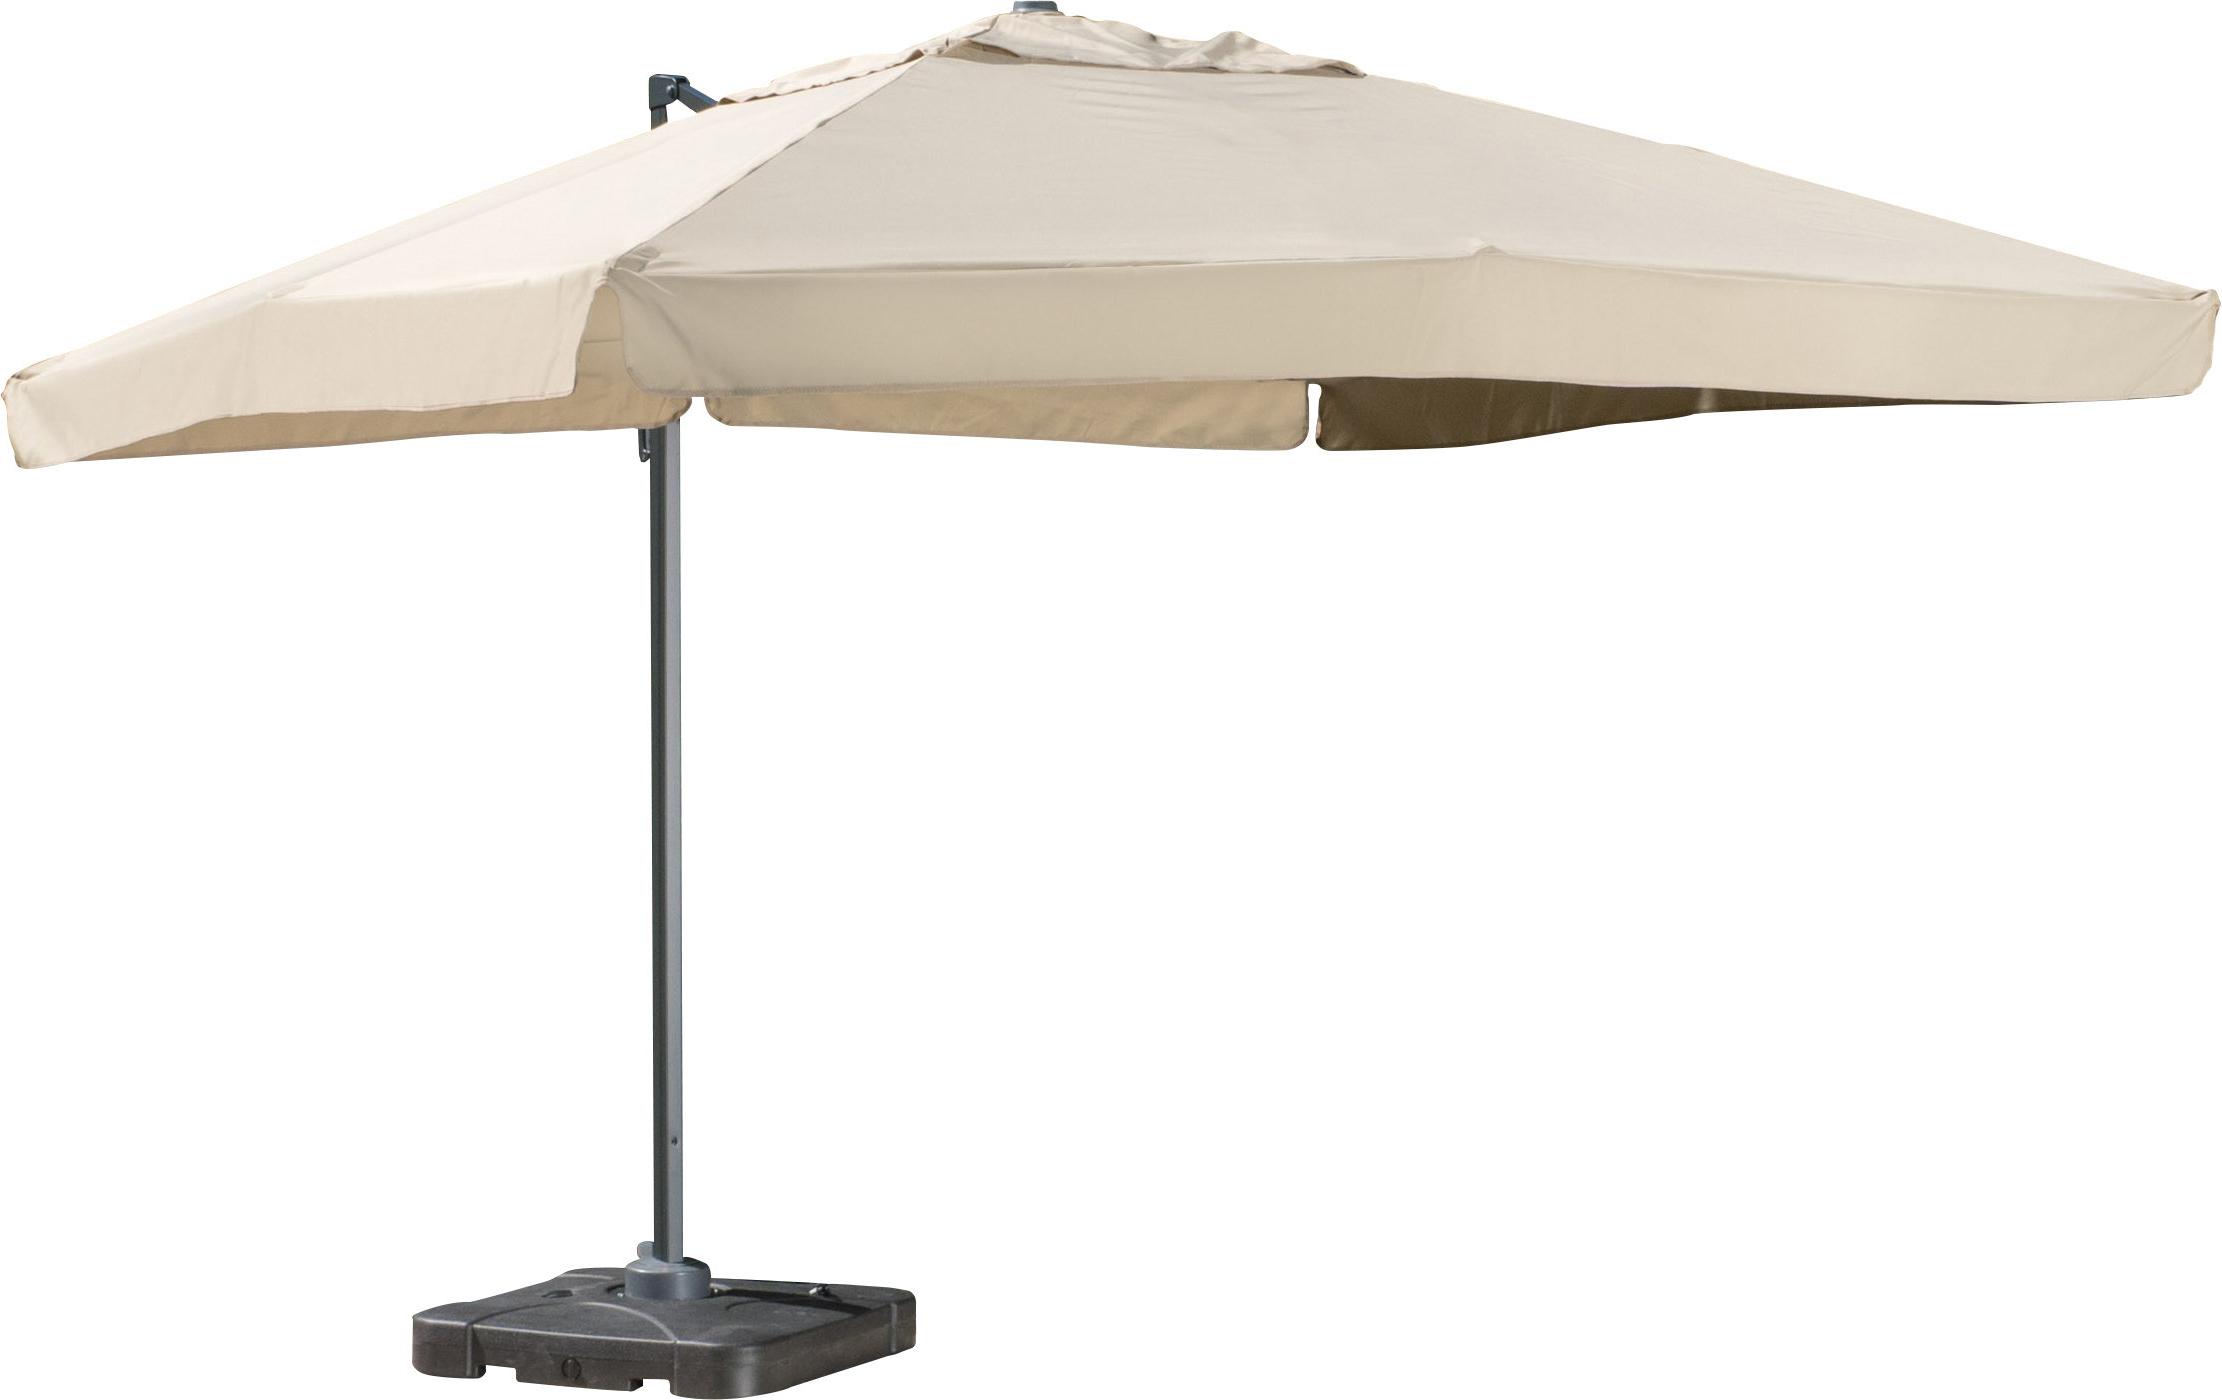 Bondi 9.8' Square Cantilever Umbrella Intended For Popular Wardingham Square Cantilever Umbrellas (Gallery 5 of 20)